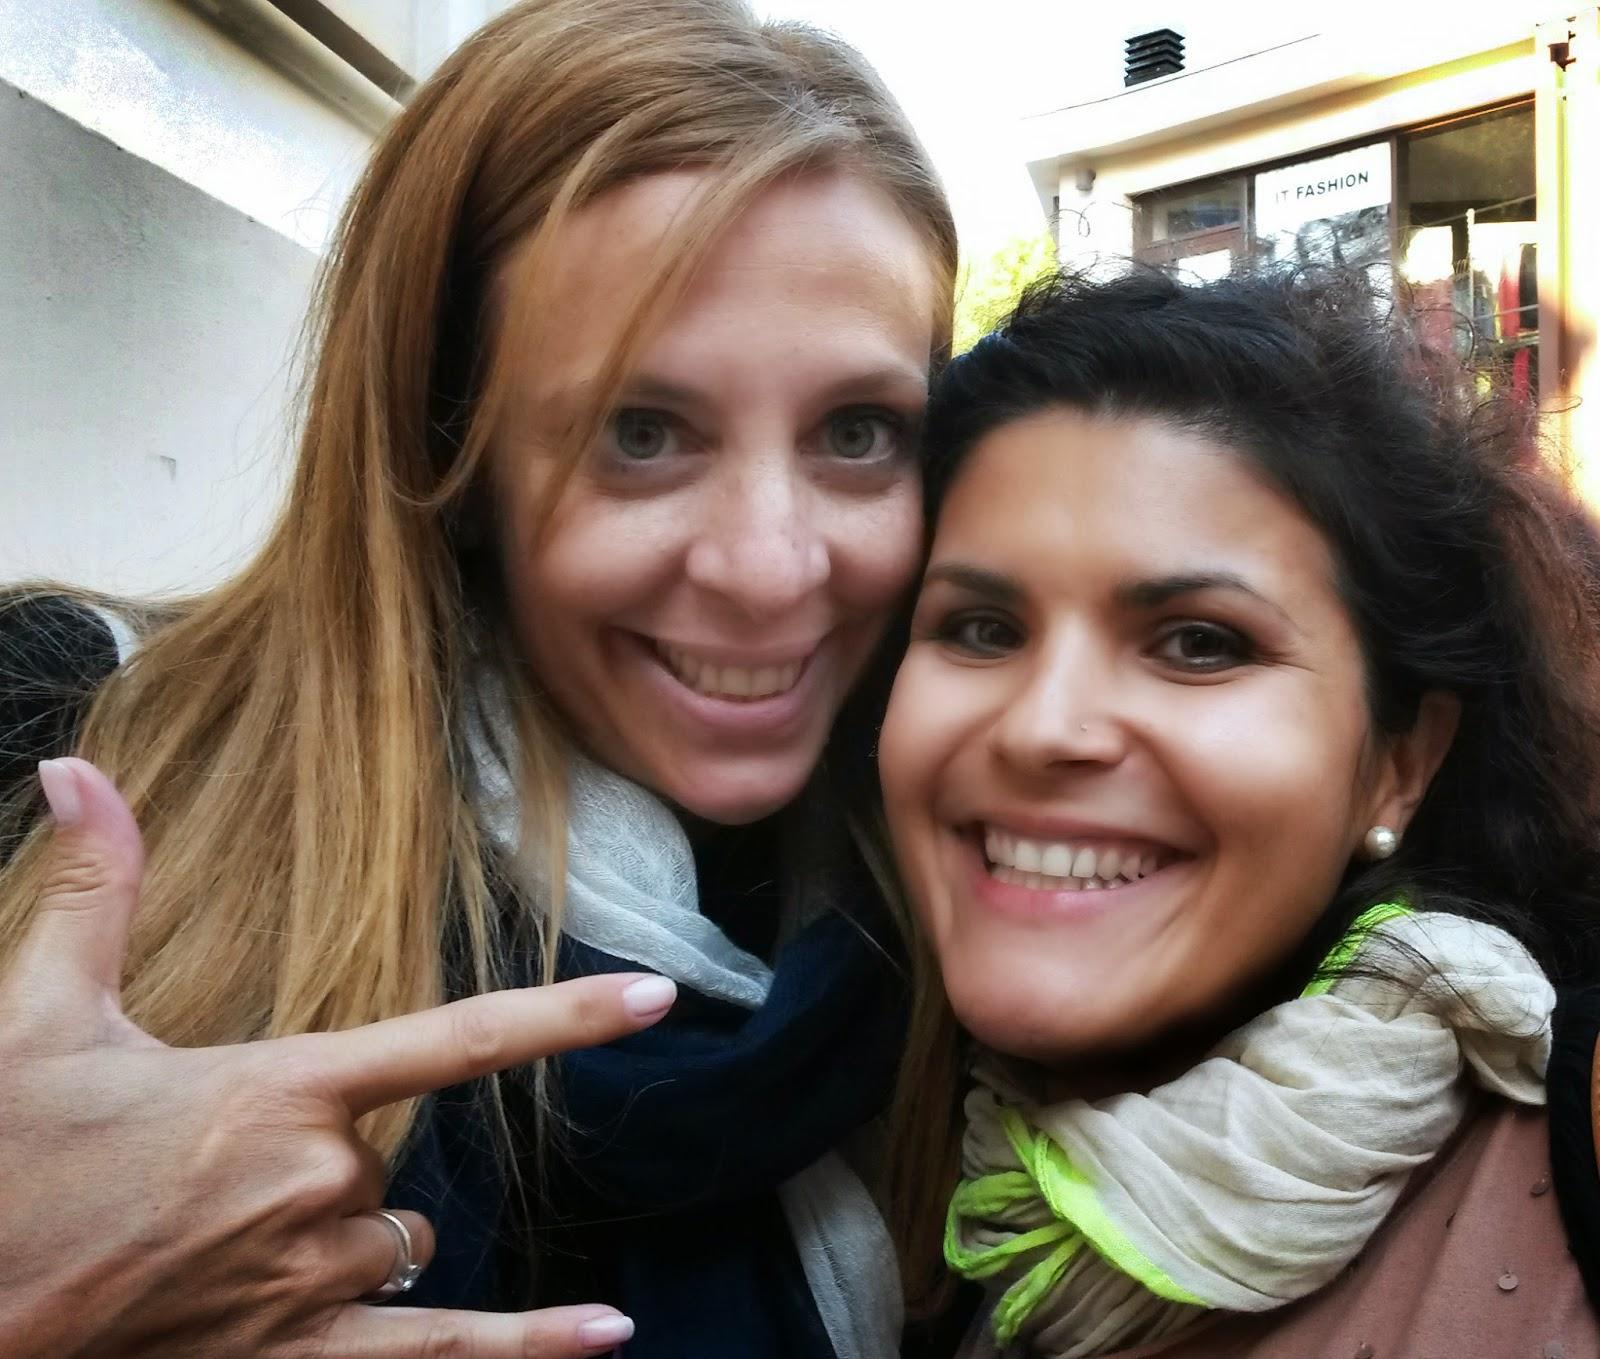 #FDR14, festa della rete, Rimini, vino, sommelier